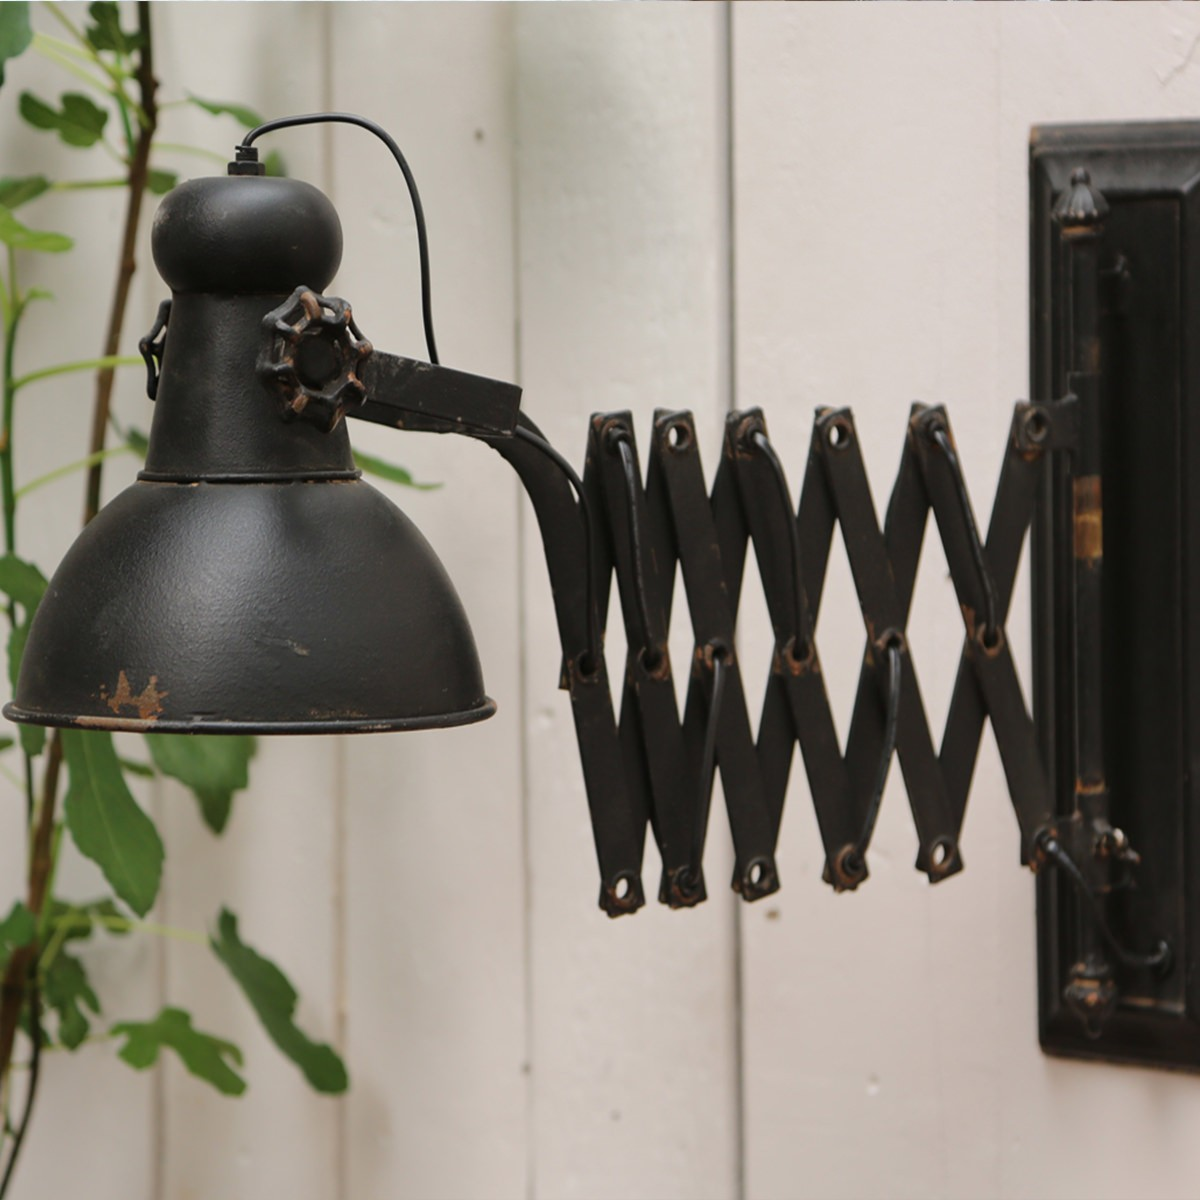 Vägglampa Factory utdragbar arm vintage fransk lantstil